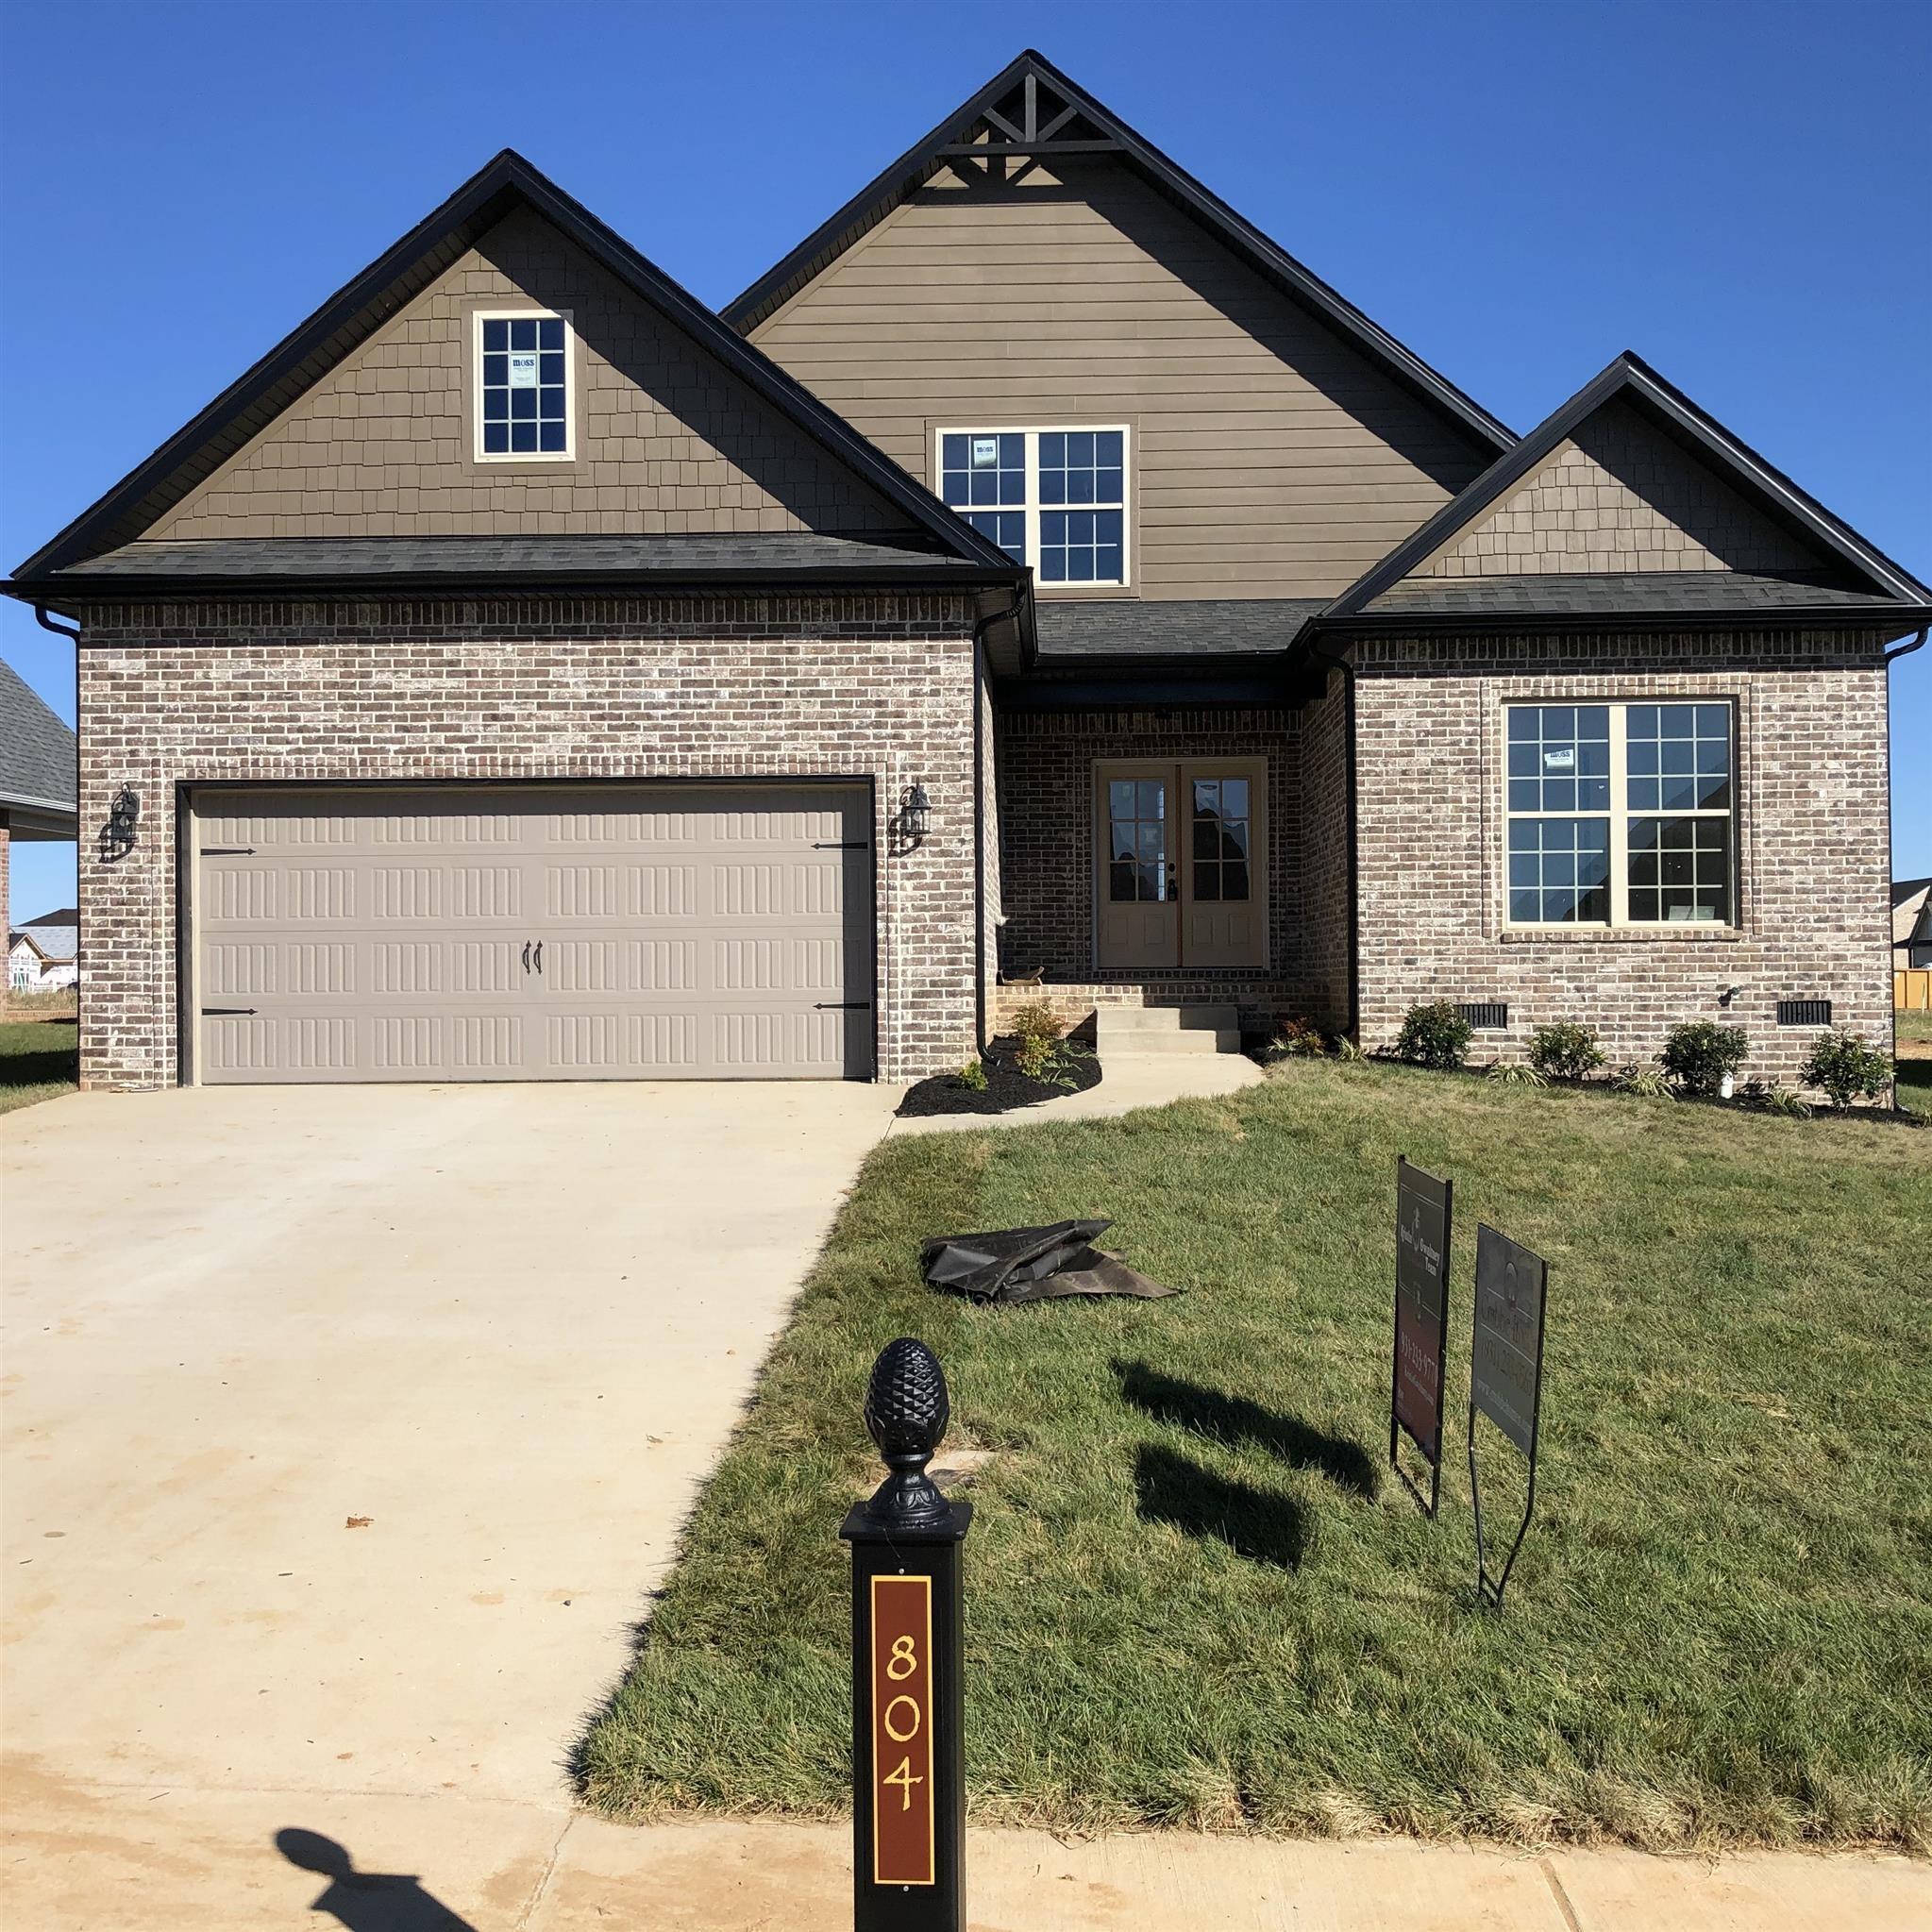 804 Ella Ln, Clarksville, TN 37043 - Clarksville, TN real estate listing